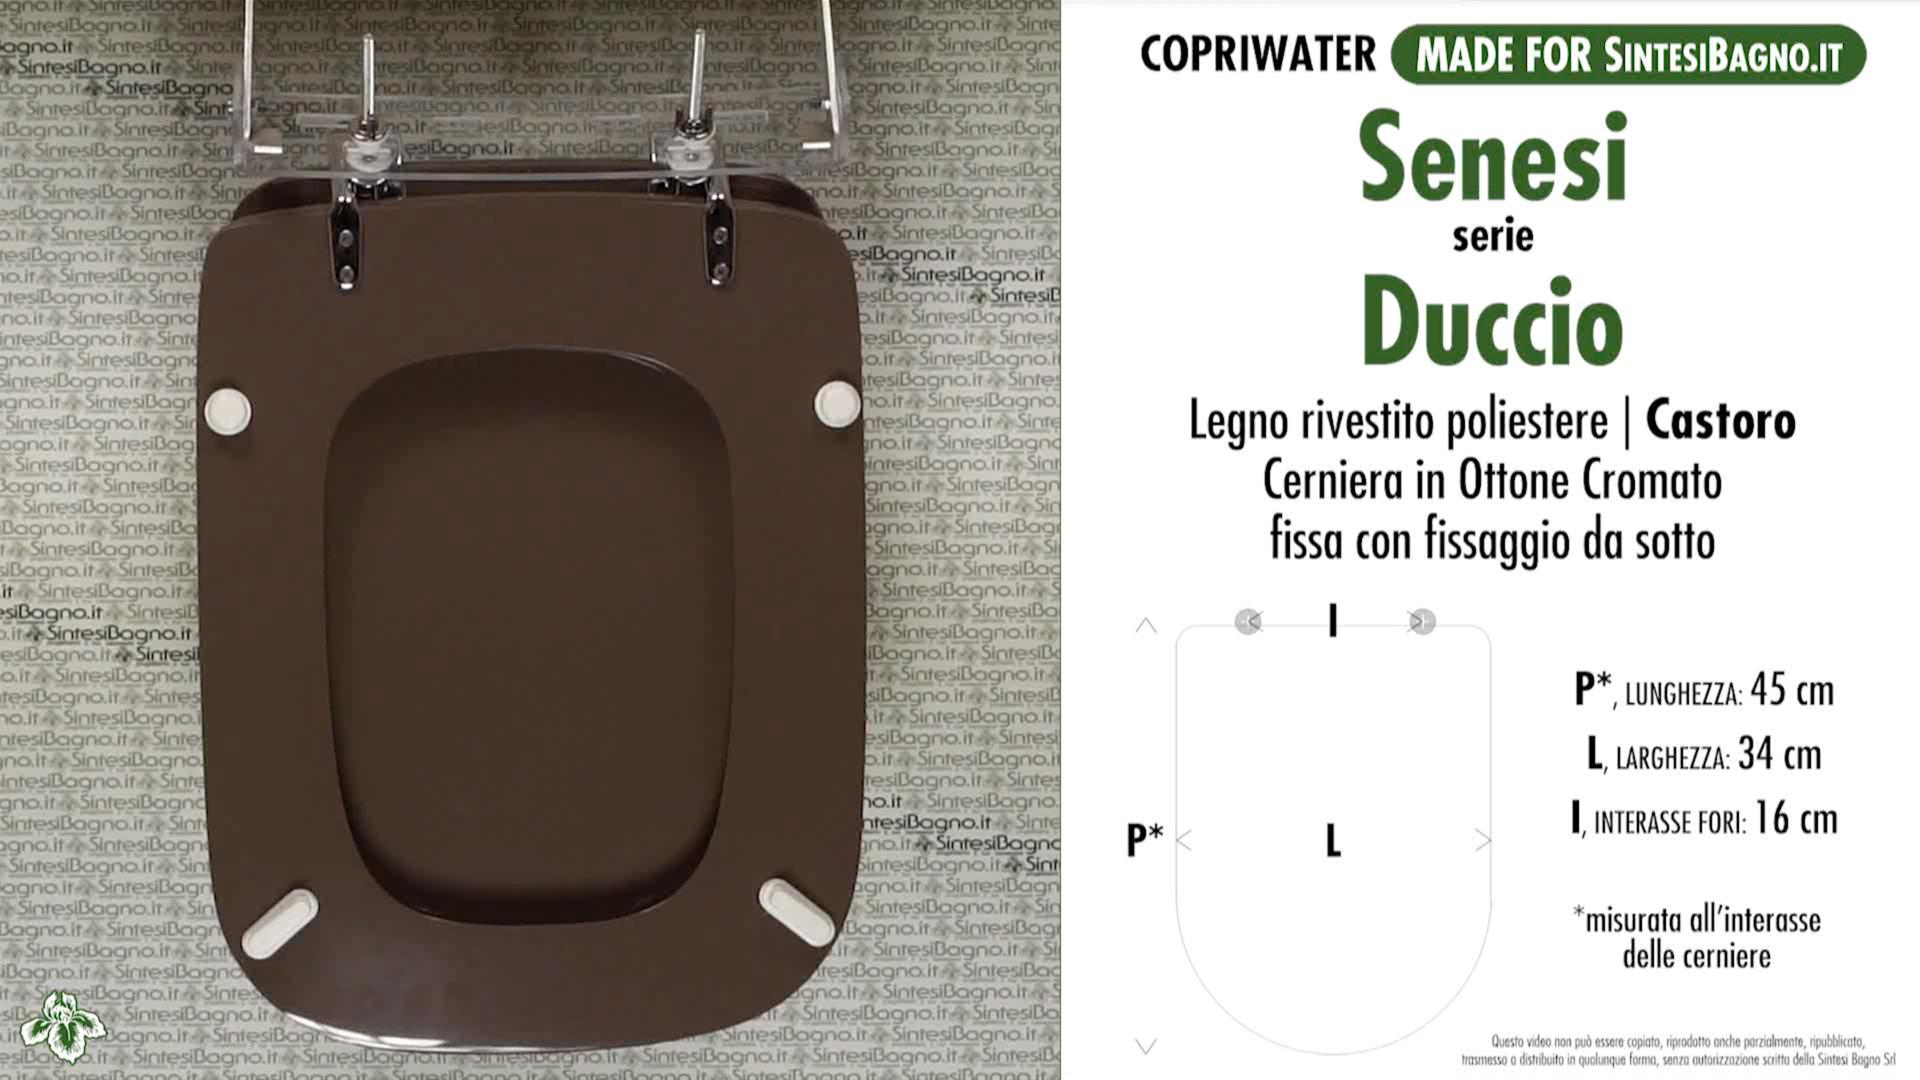 scheda-tecnica-datasheet-copriwater-senesi-serie-duccio-castoro